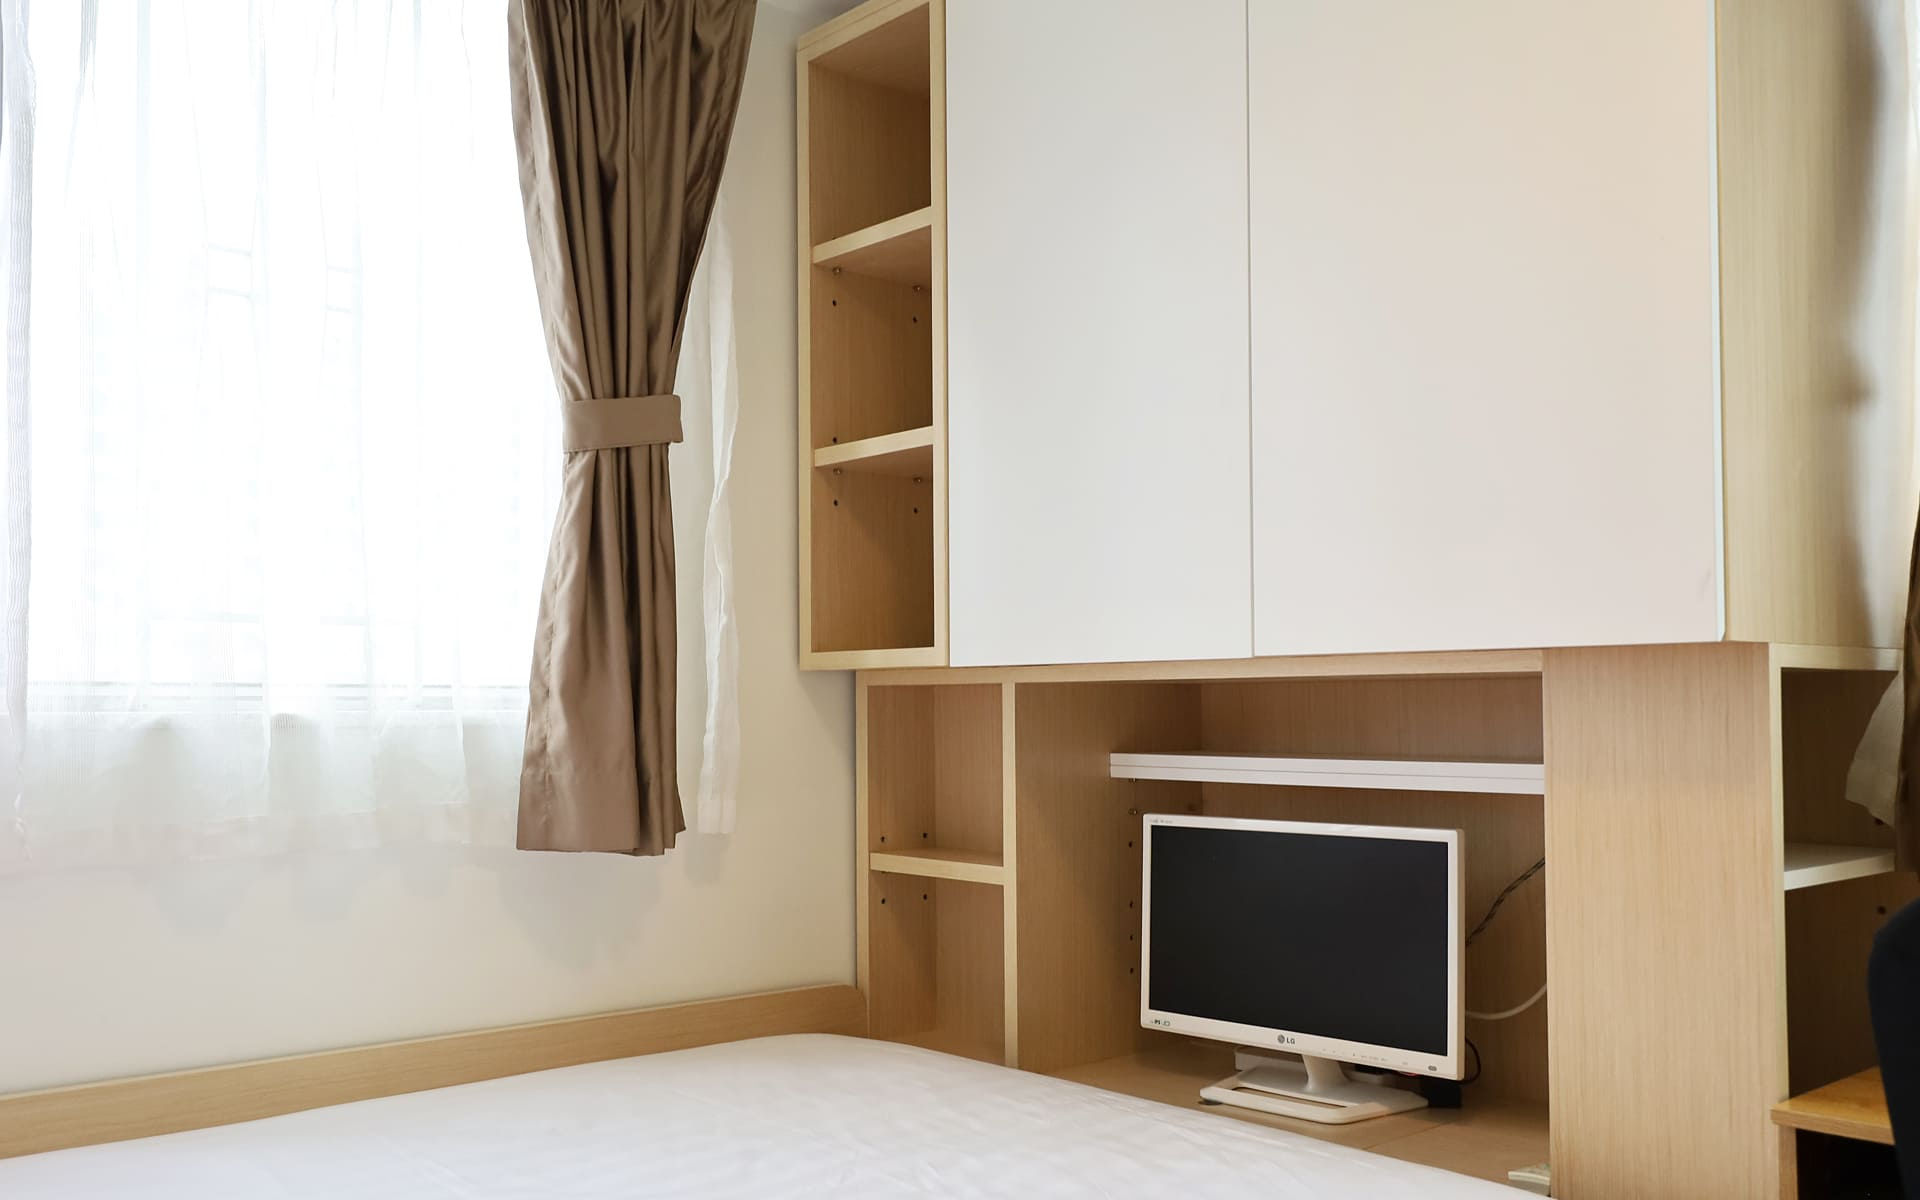 hk_service_apartment_17115530311589362127.jpg